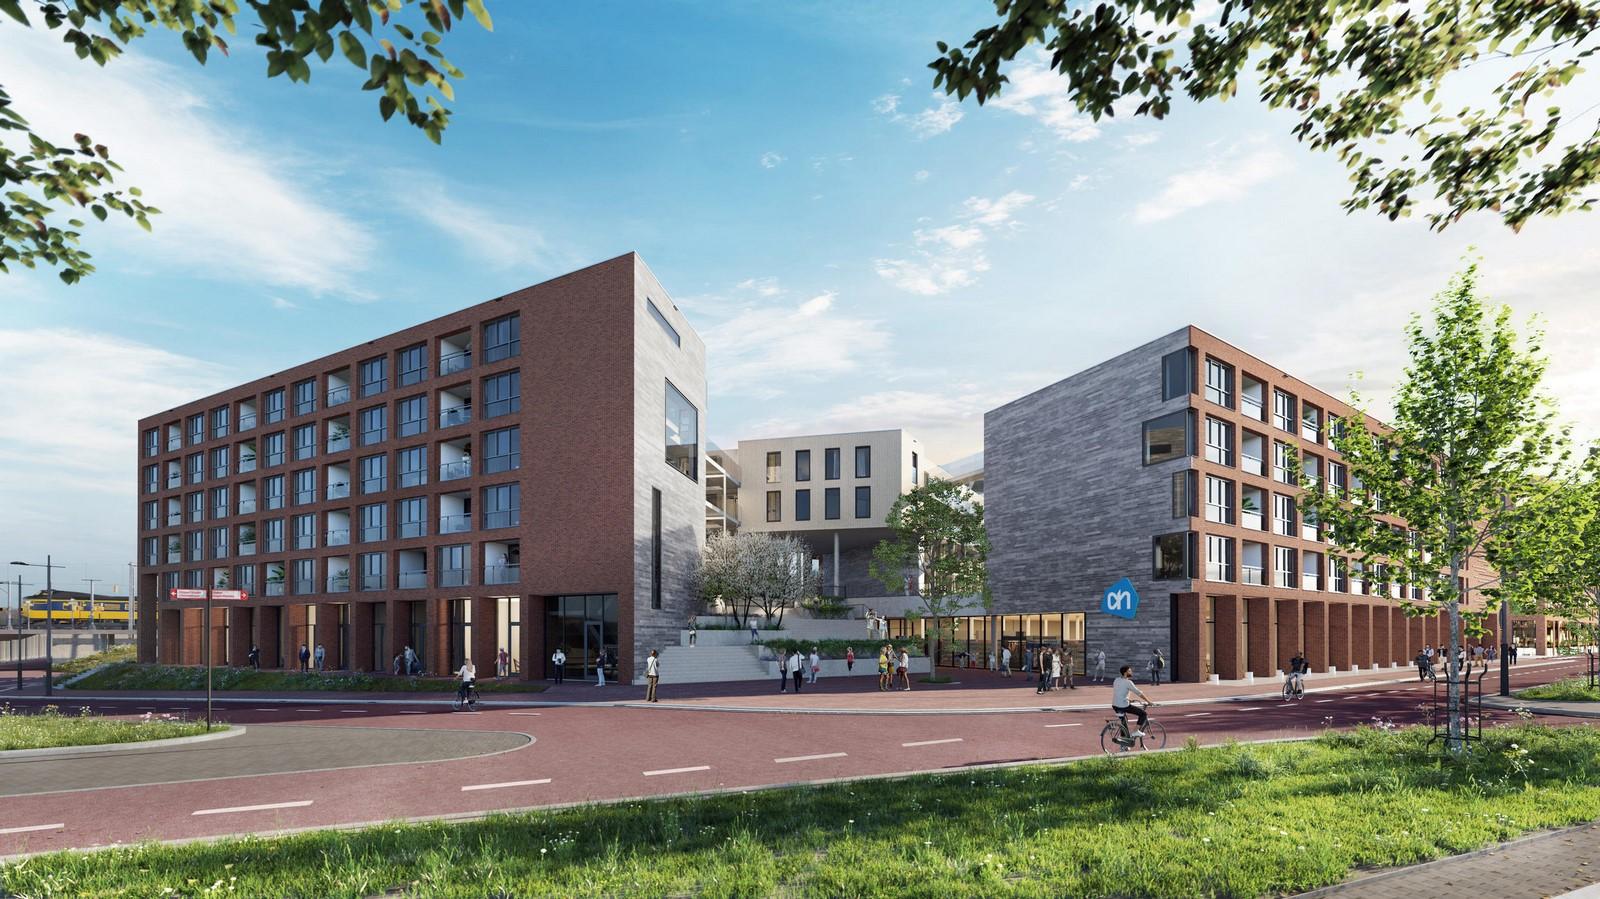 Architects in Breda - Top 55 Architects in Breda - Sheet45